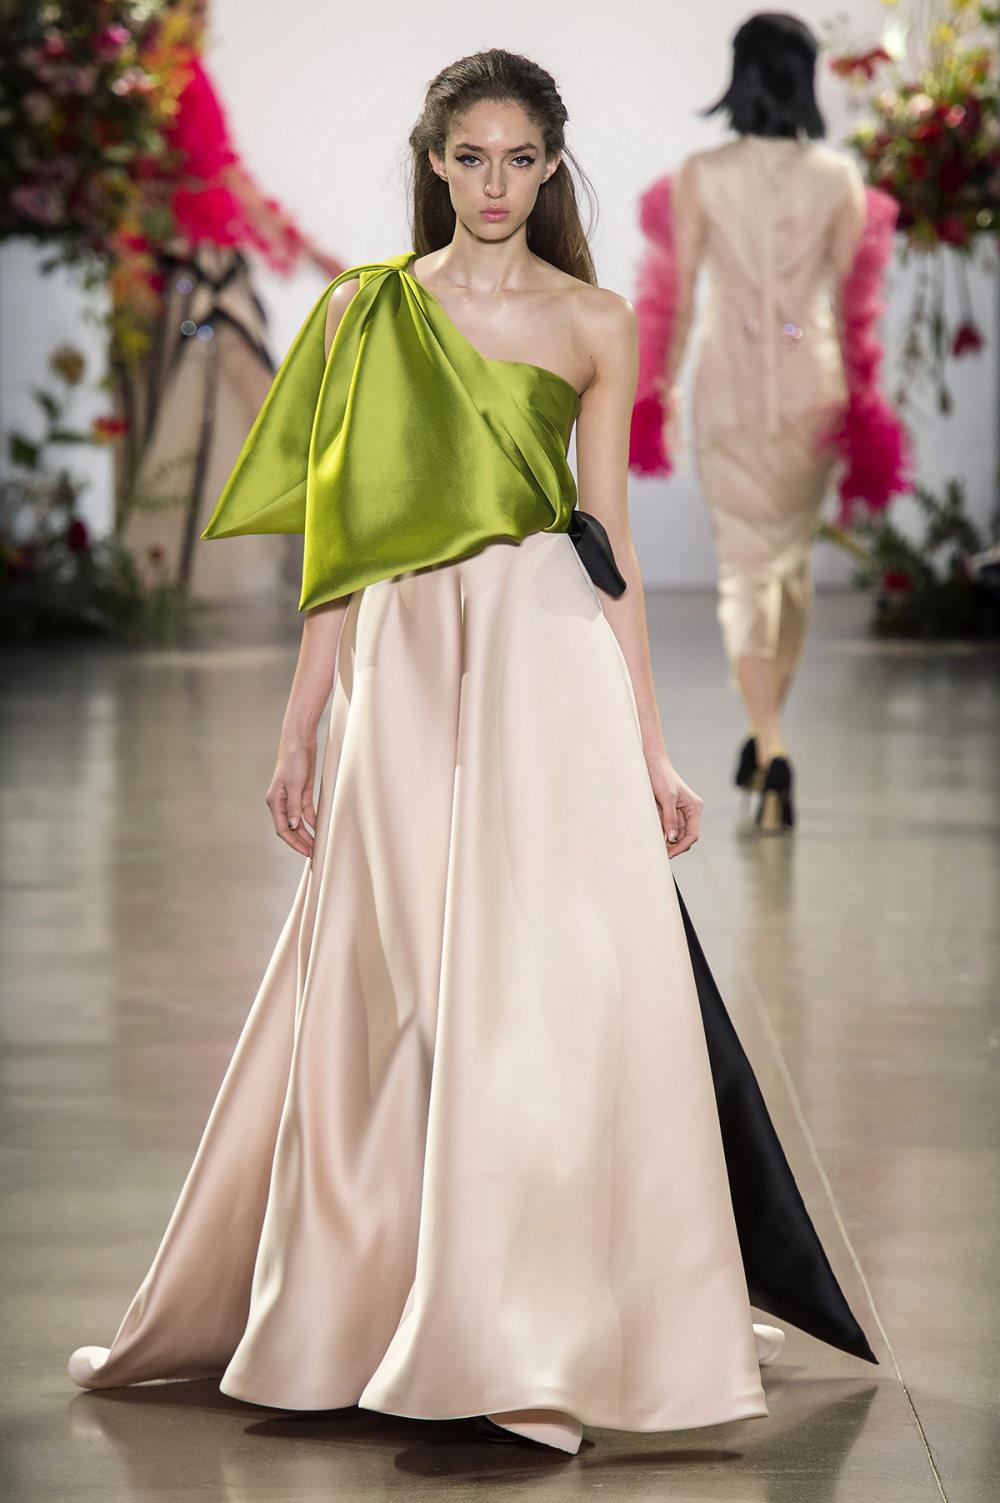 Bibhu Mohapatra时装系列颜色点缀蕾丝刺绣和结构的压轴礼服-32.jpg